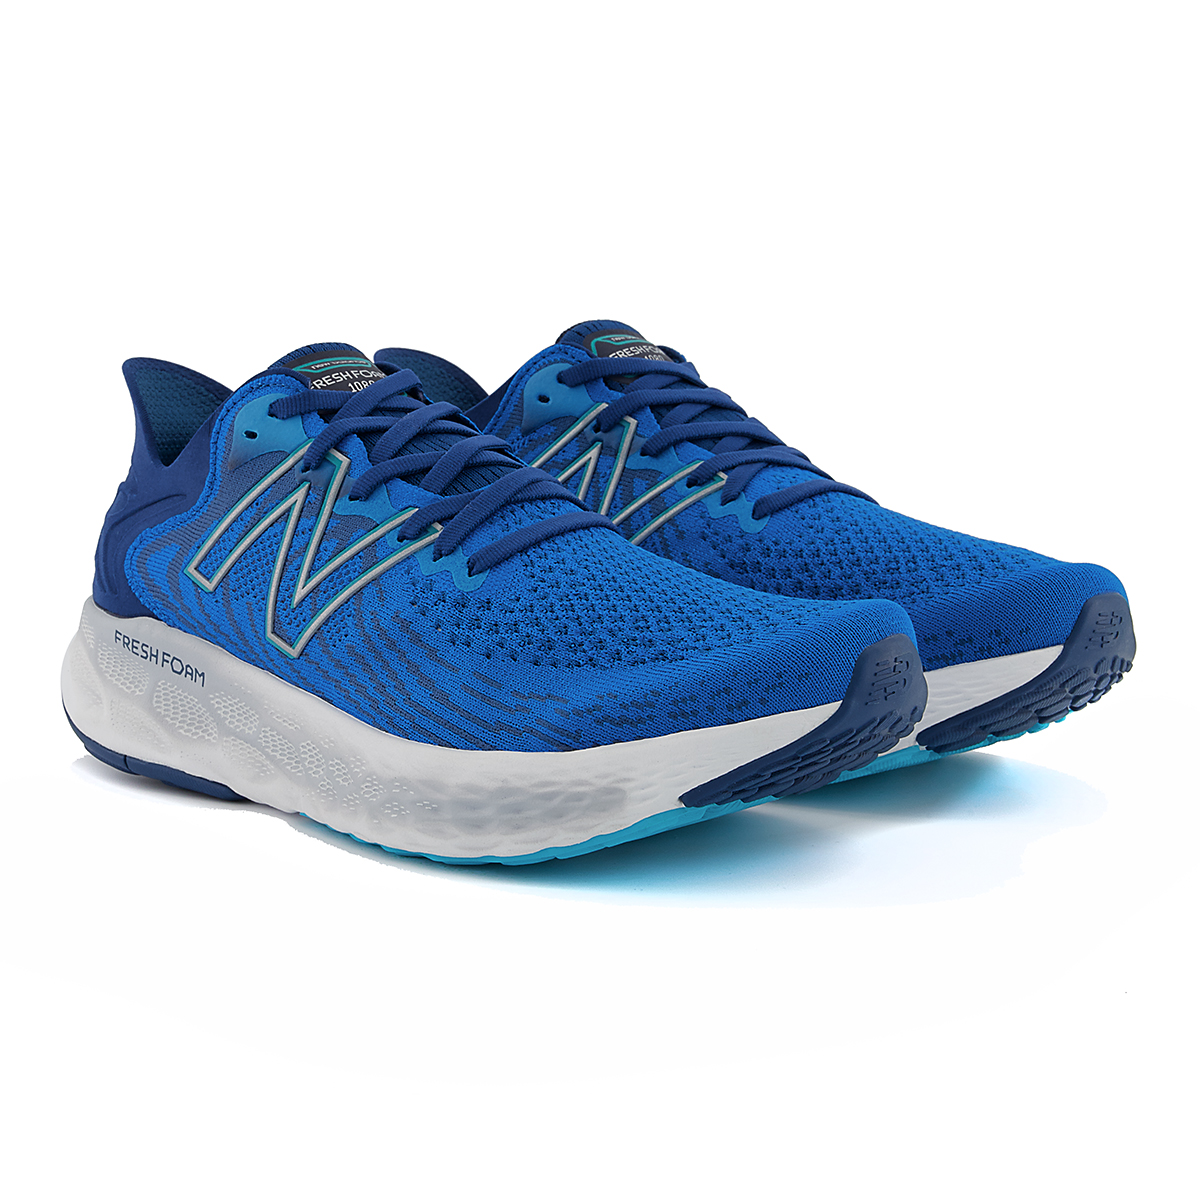 Men's New Balance Fresh Foam 1080v11 Running Shoe - Color: Wave/Light Rogue Wave - Size: 6 - Width: Wide, Wave/Light Rogue Wave, large, image 3